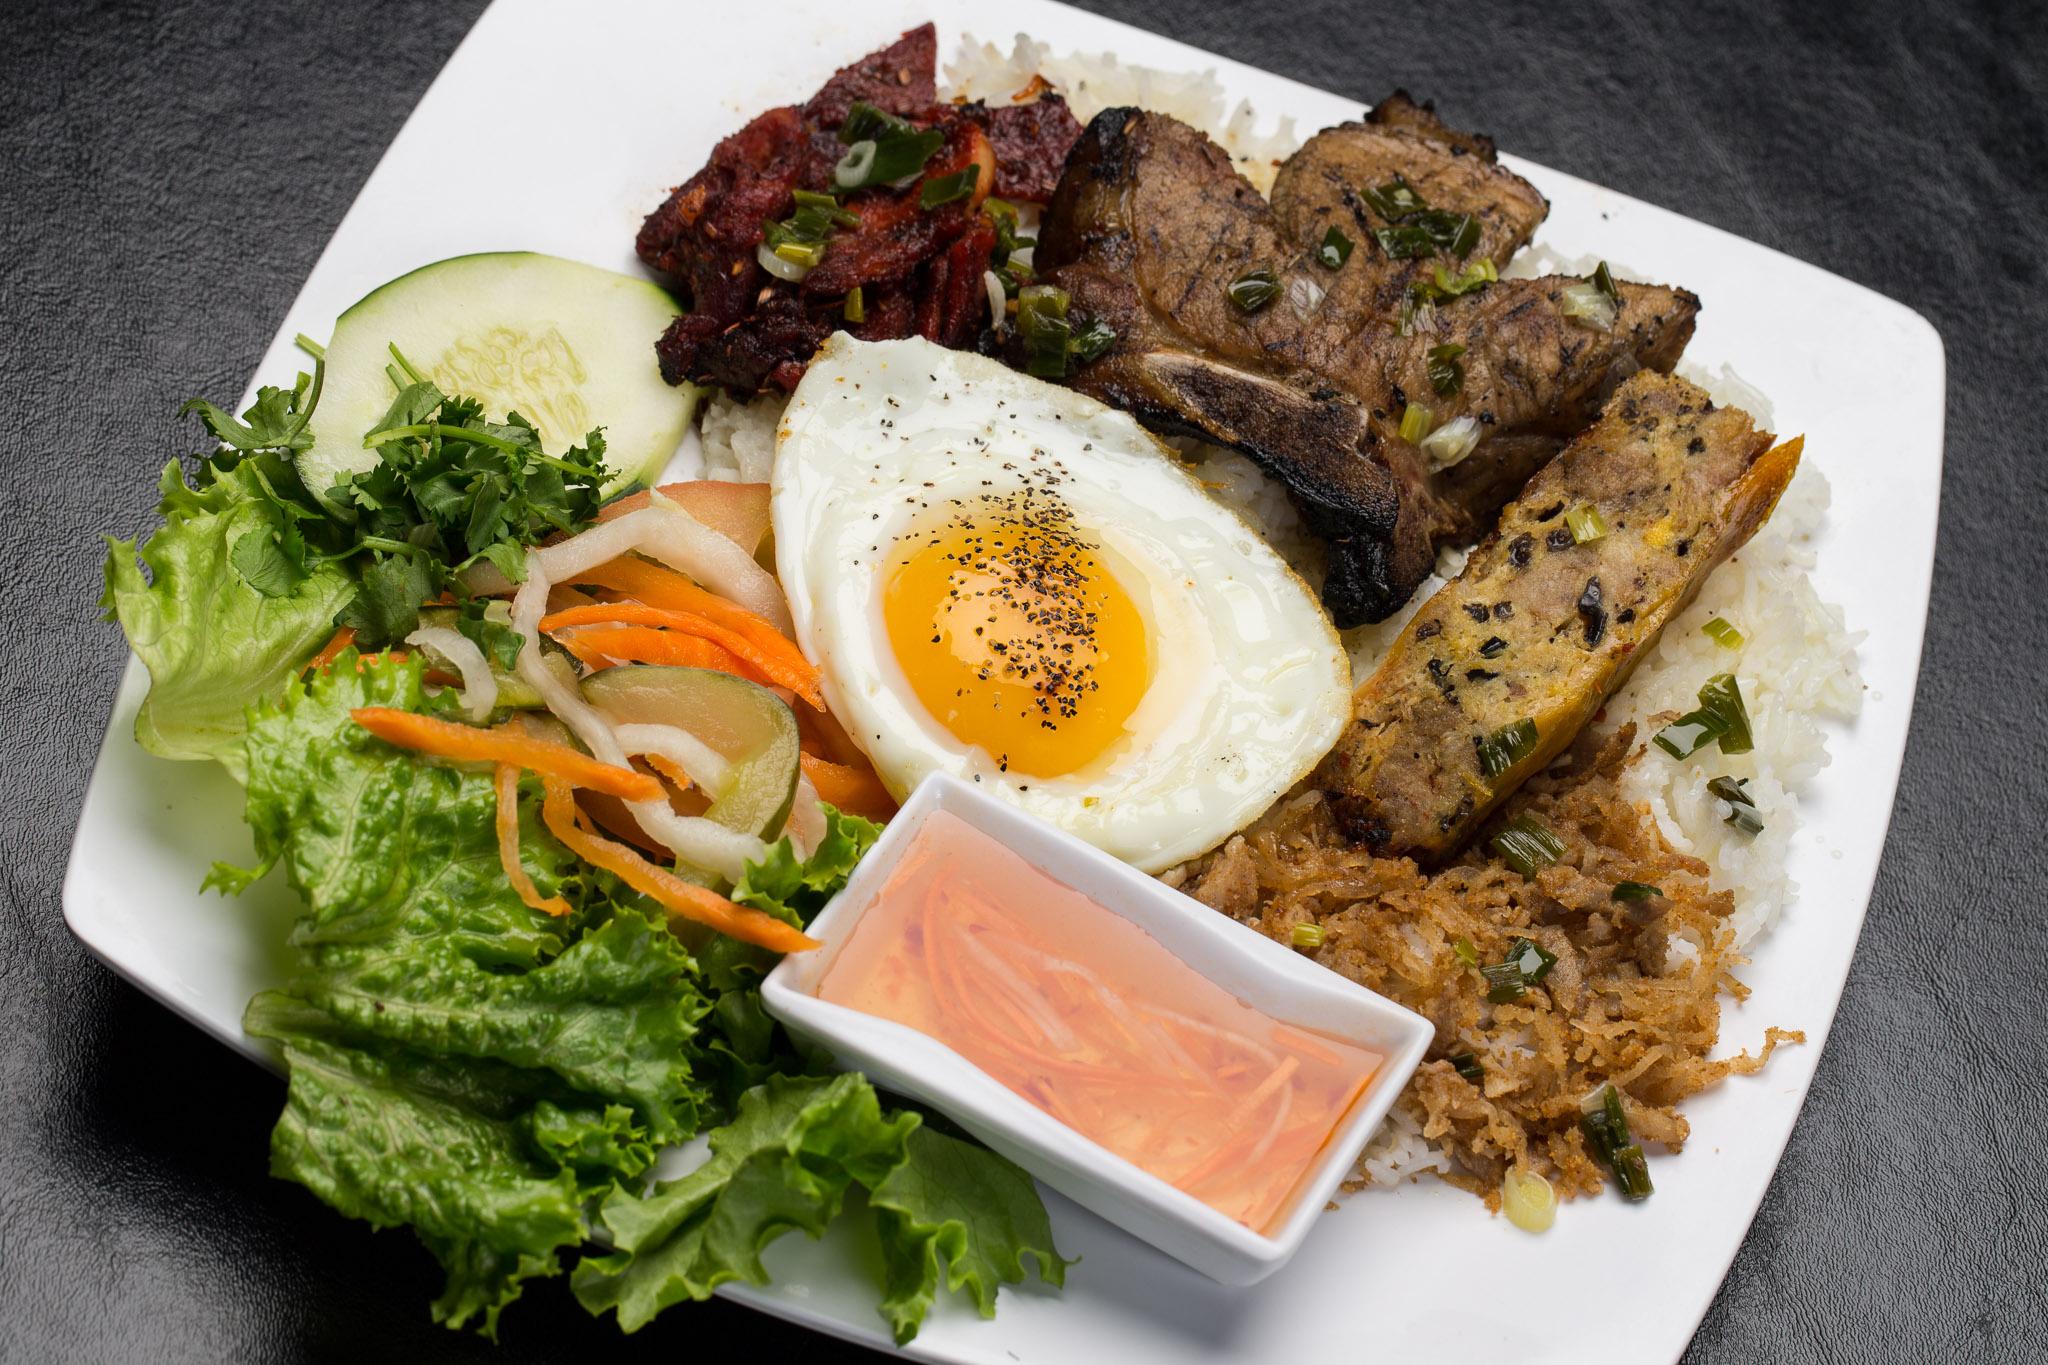 7.01 Com Dac Biet  | crushed rice platter topped with char-grilled pork, marinatedpork-chop, over-easy egg, egg-cake, & shredded pork served with sweet lemon sauce.